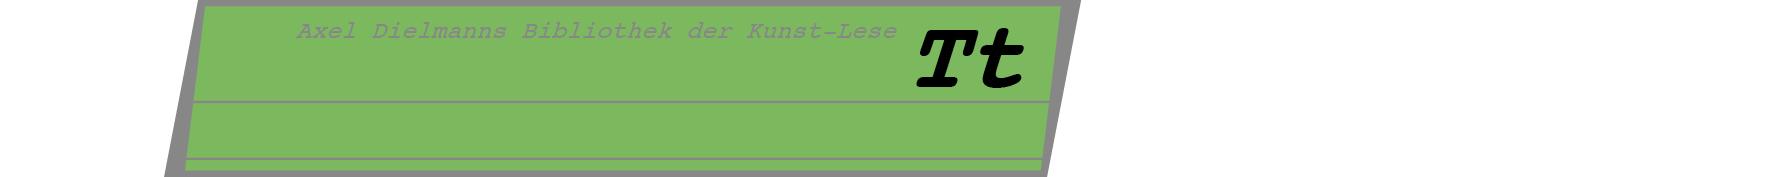 Kartei-T